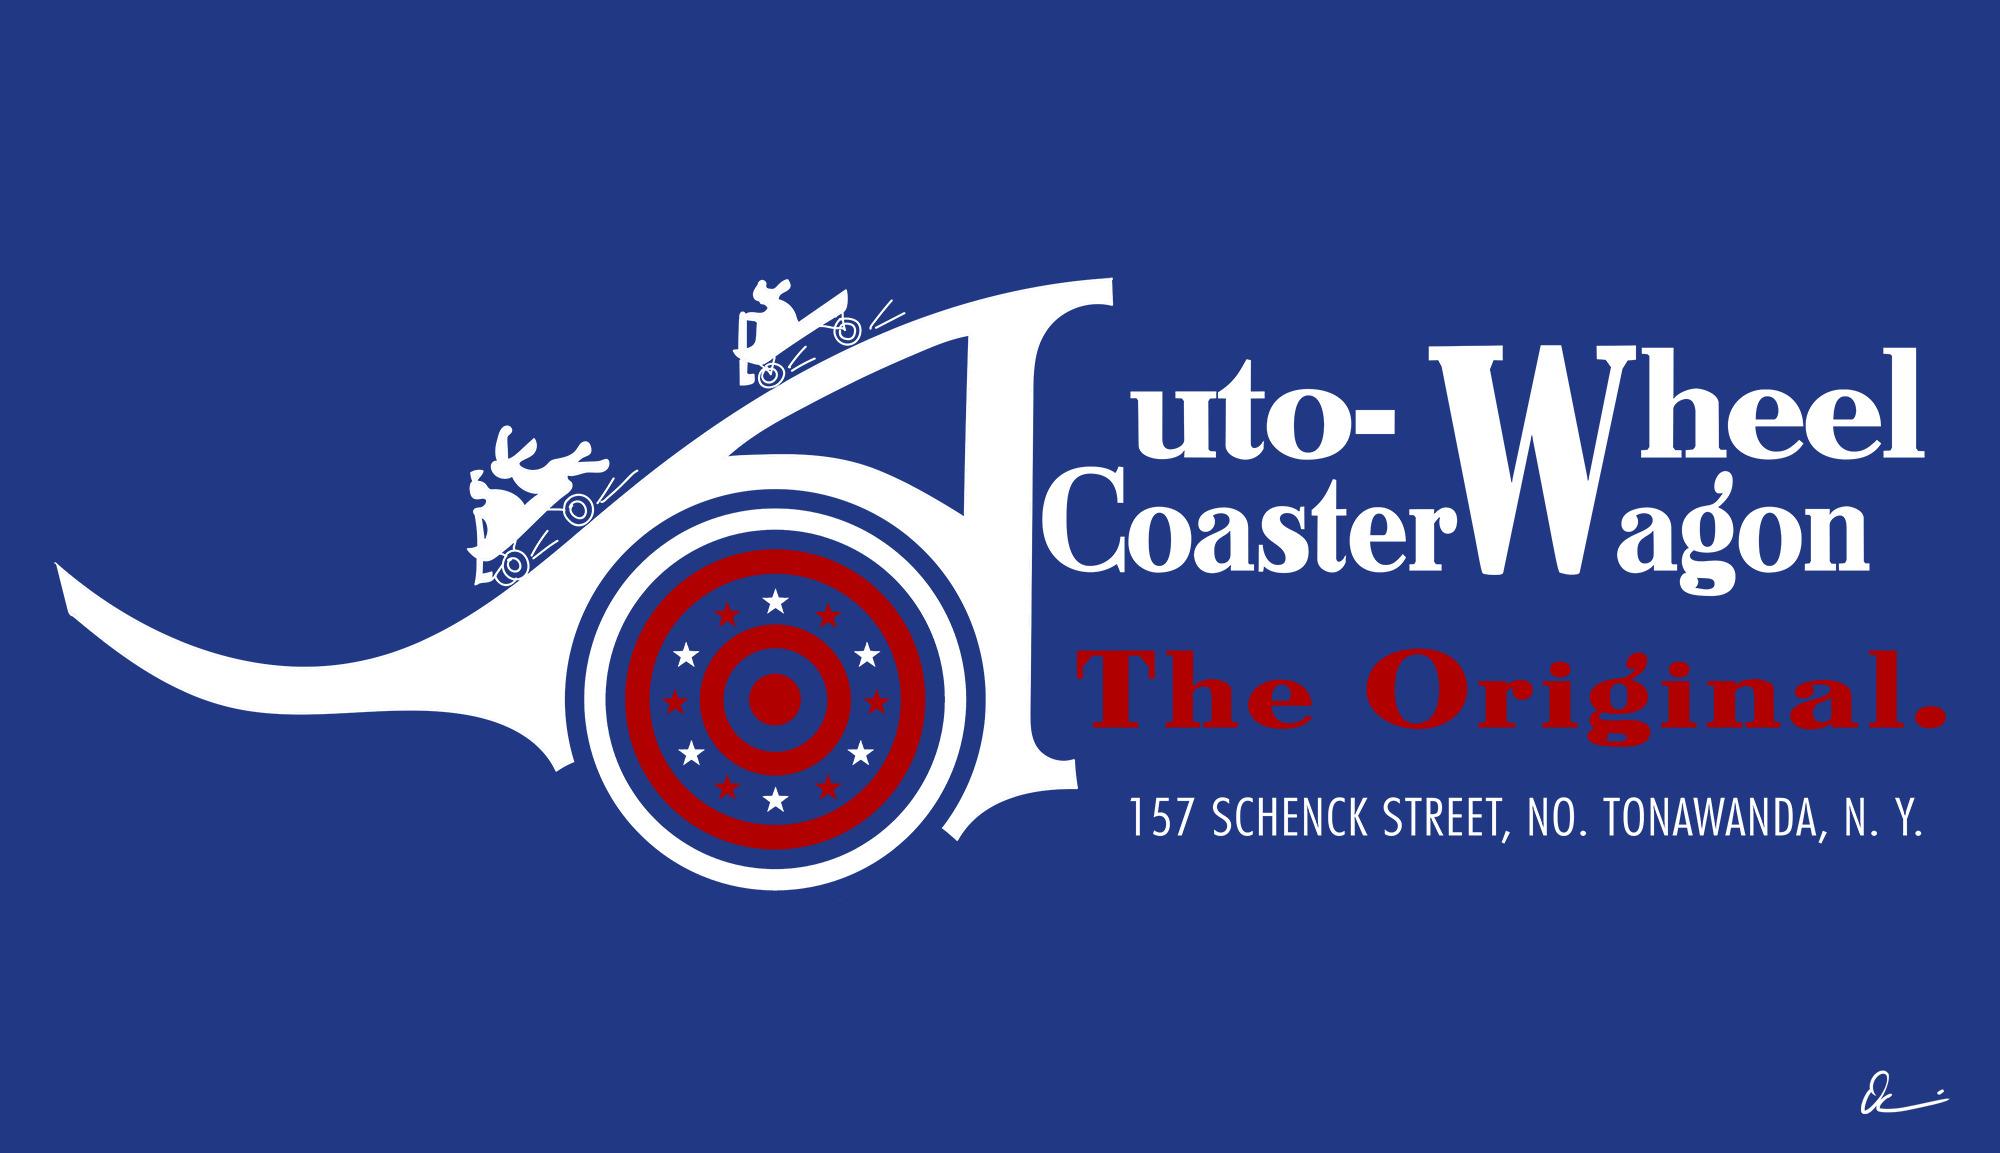 Auto Wheel Coaster Wagon, ad (Dennis Reed Jr, 2017)